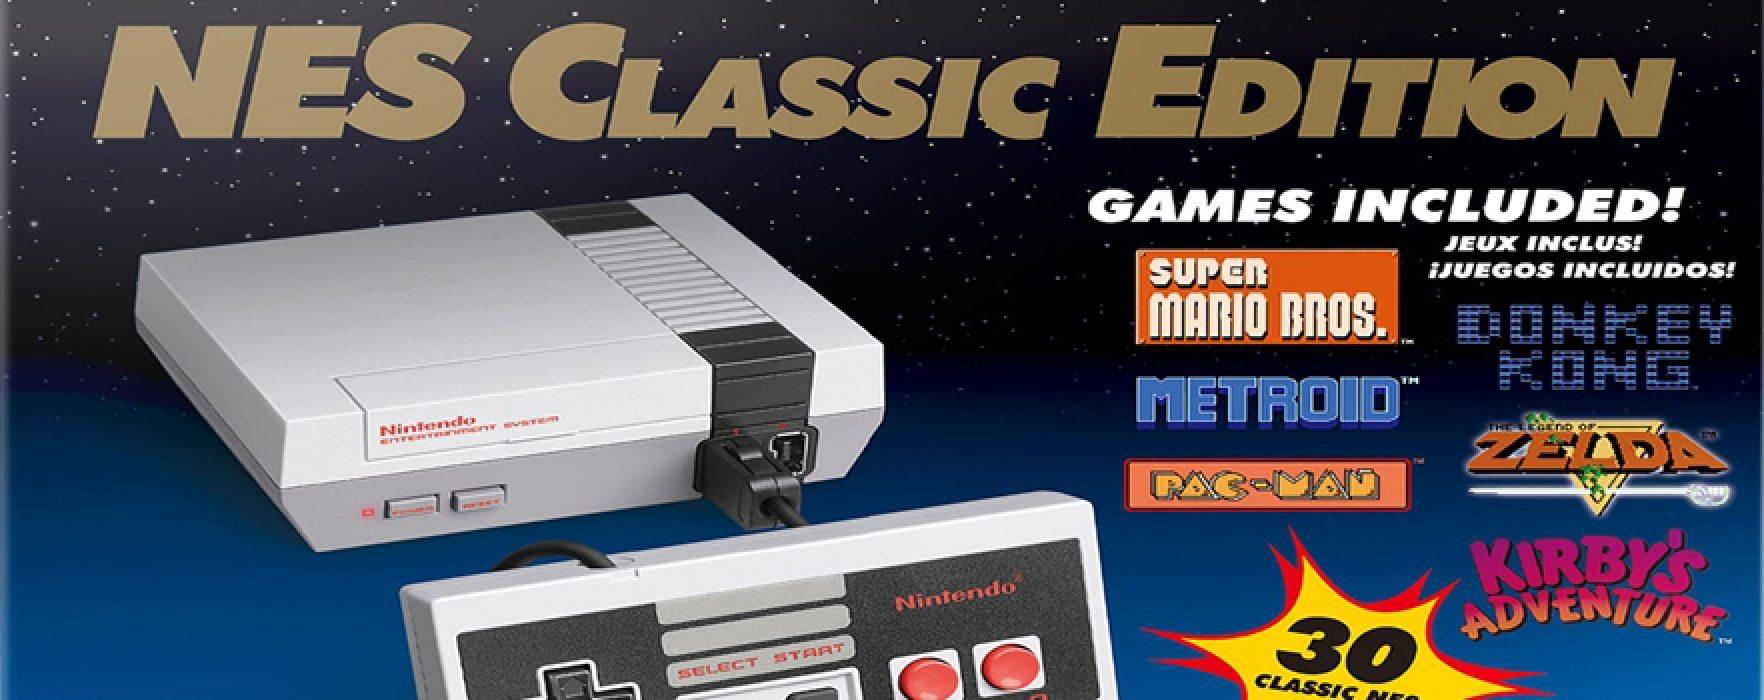 Nintendo Discontinues NES Classic